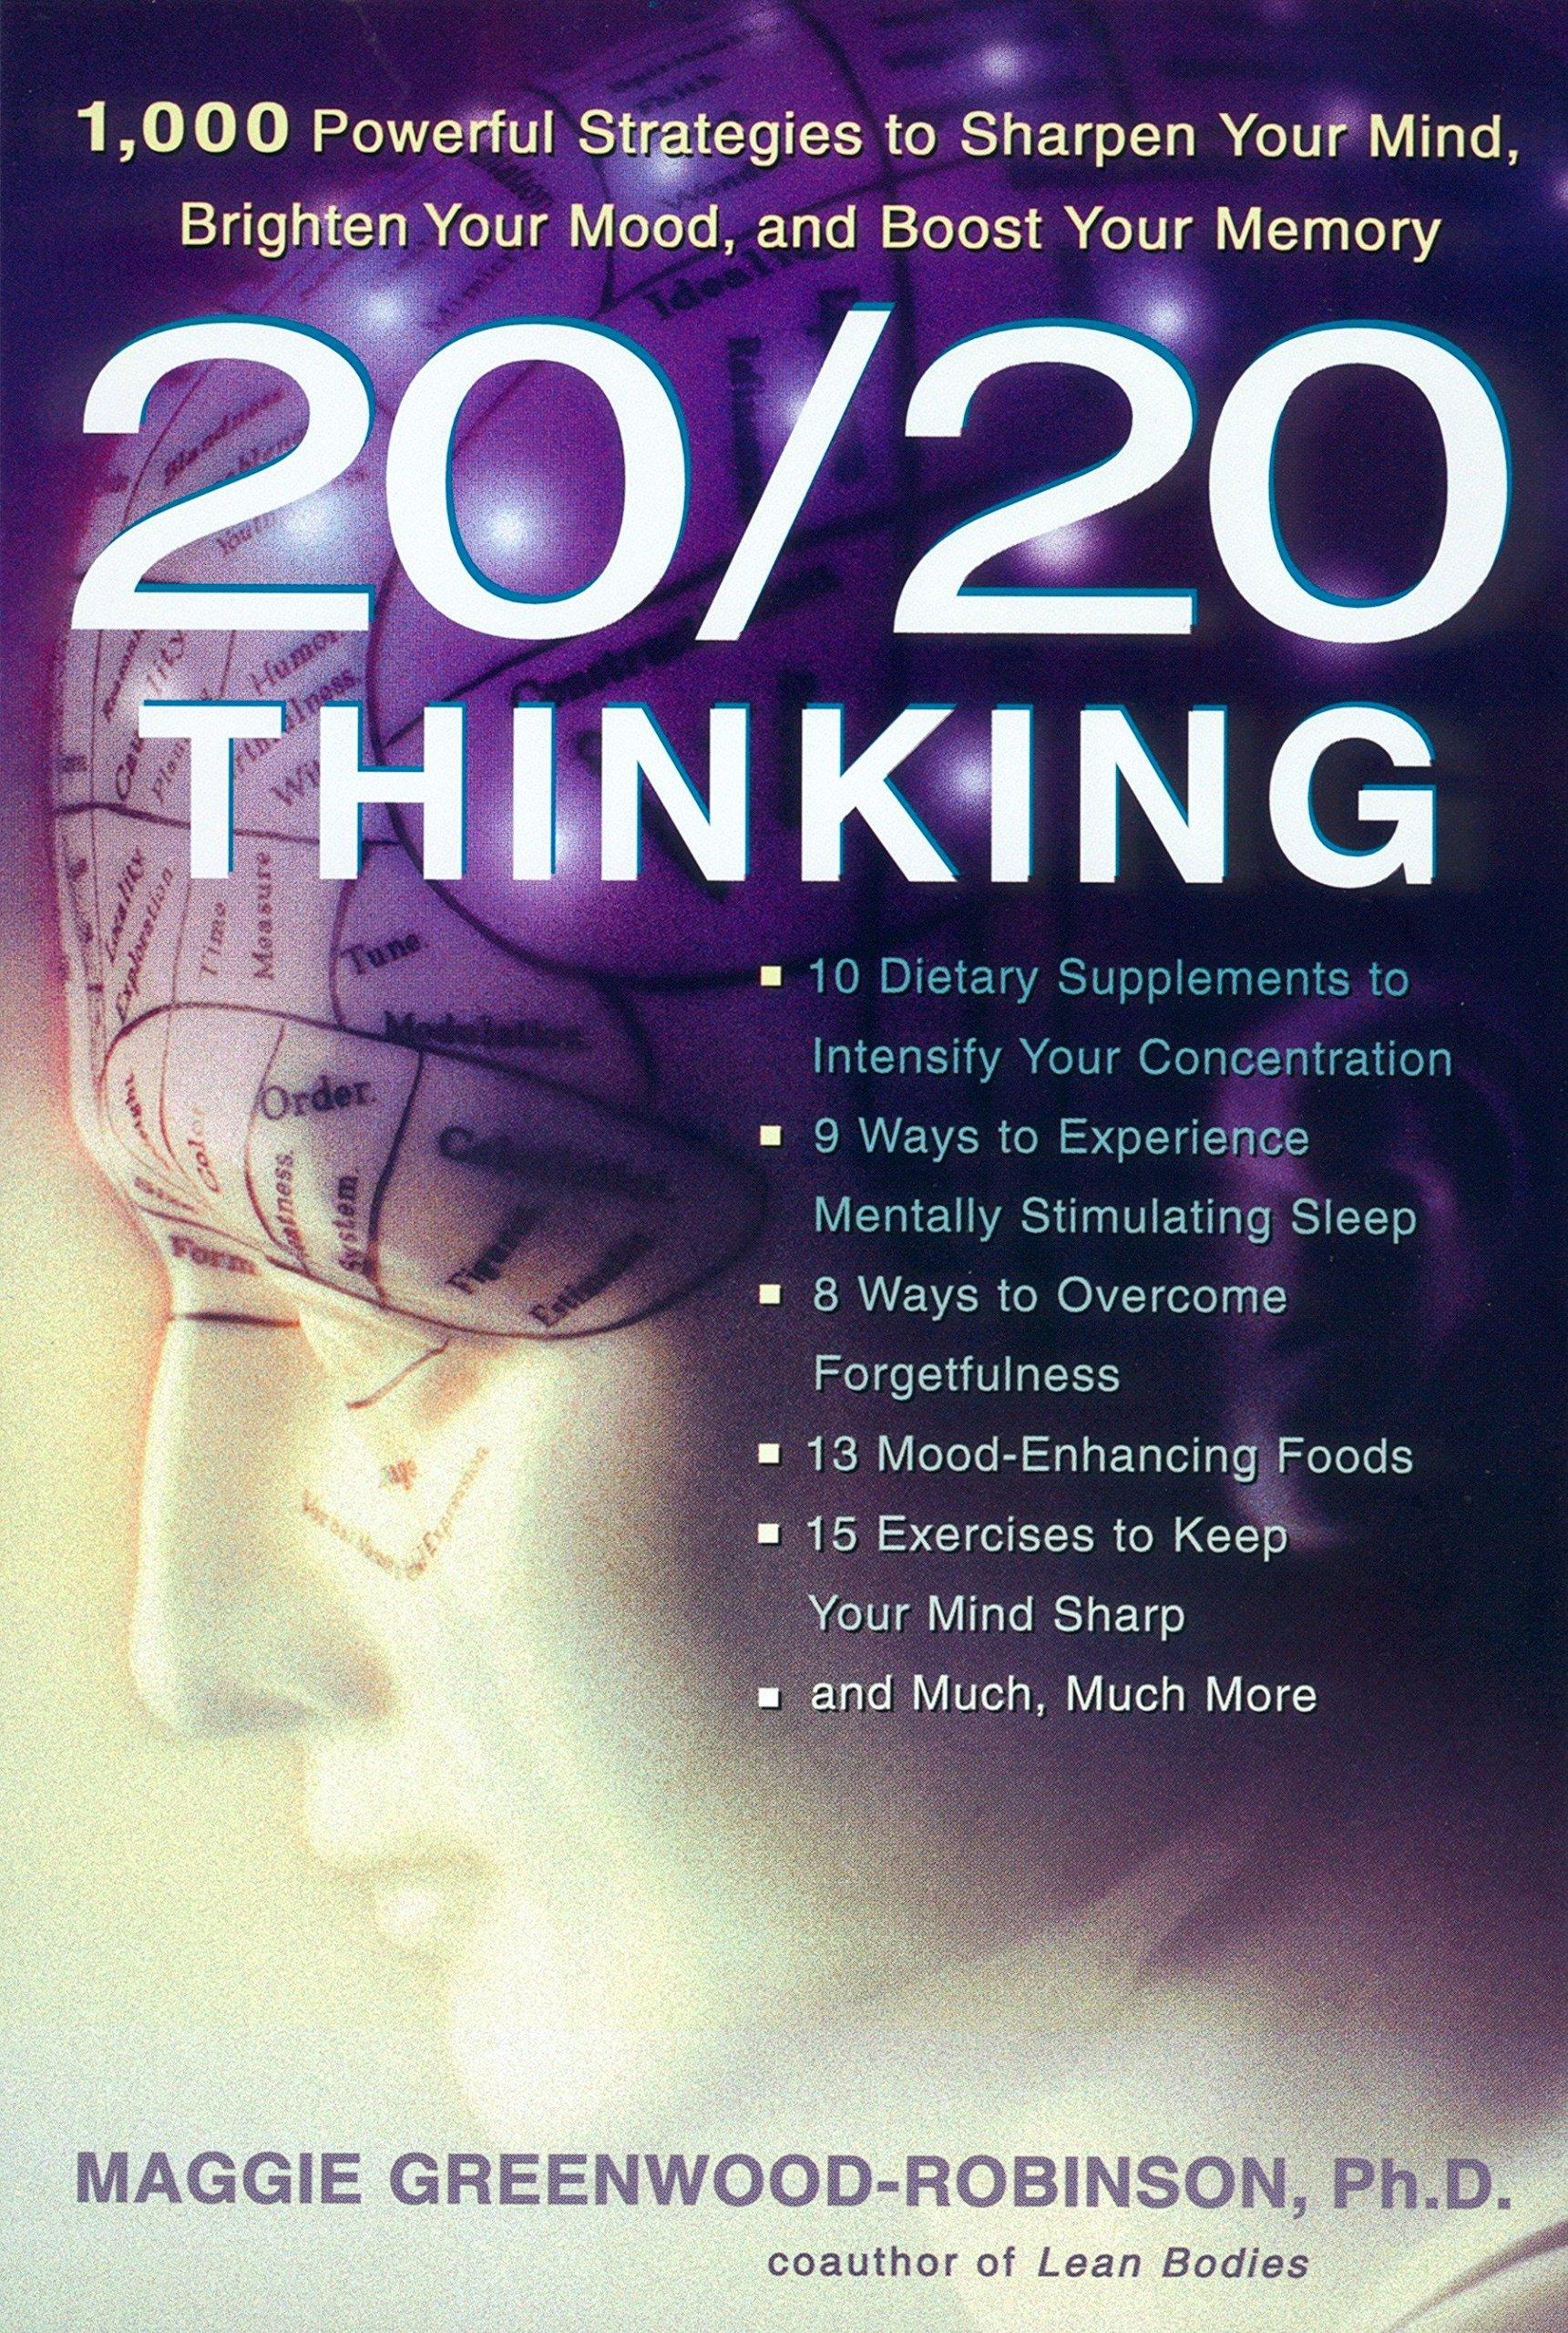 20/20 Thinking